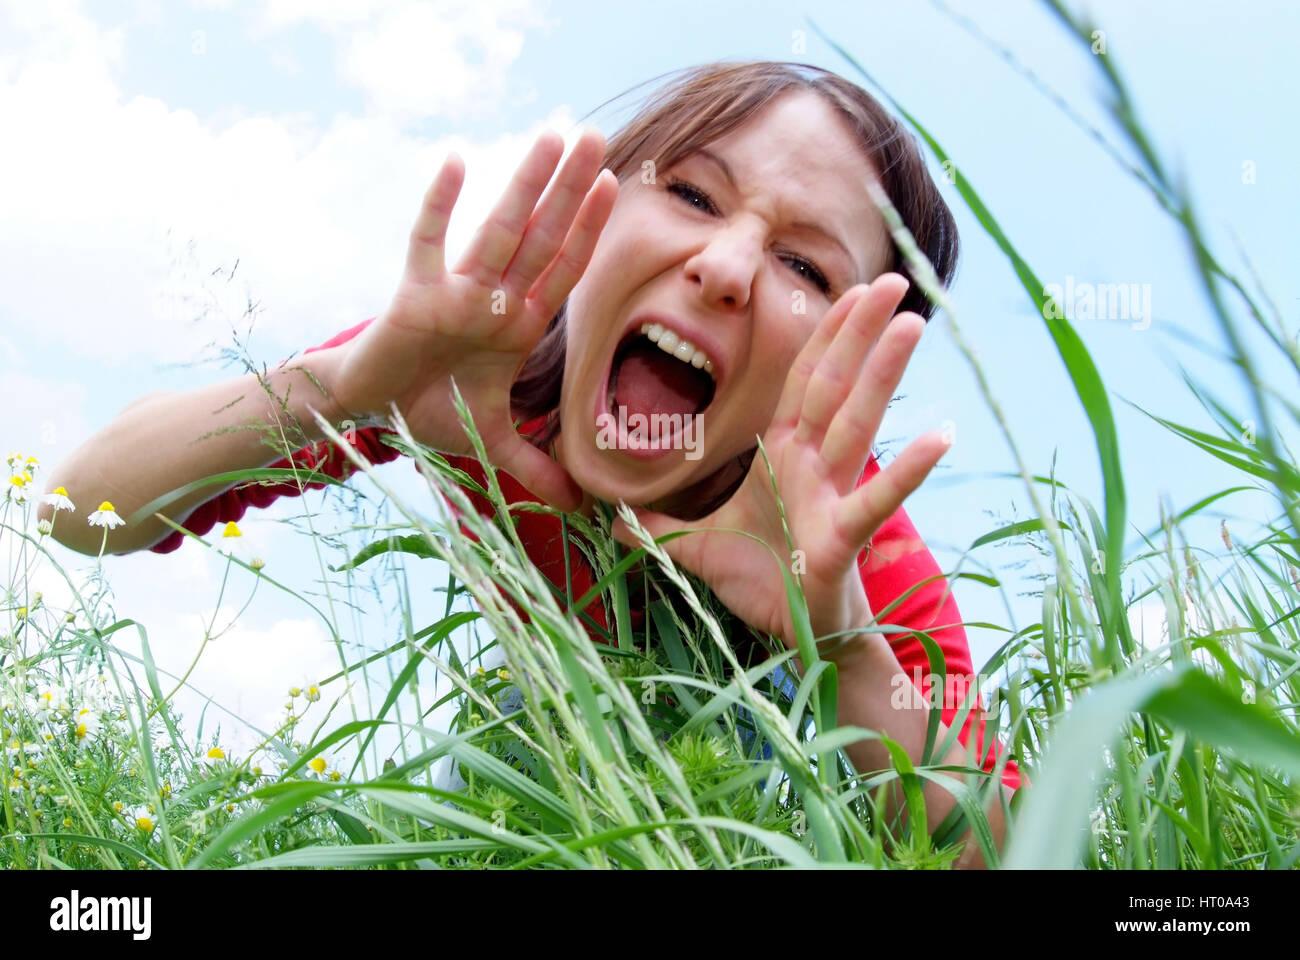 schreiende Frau im Gras - screaming woman in grass Stock Photo